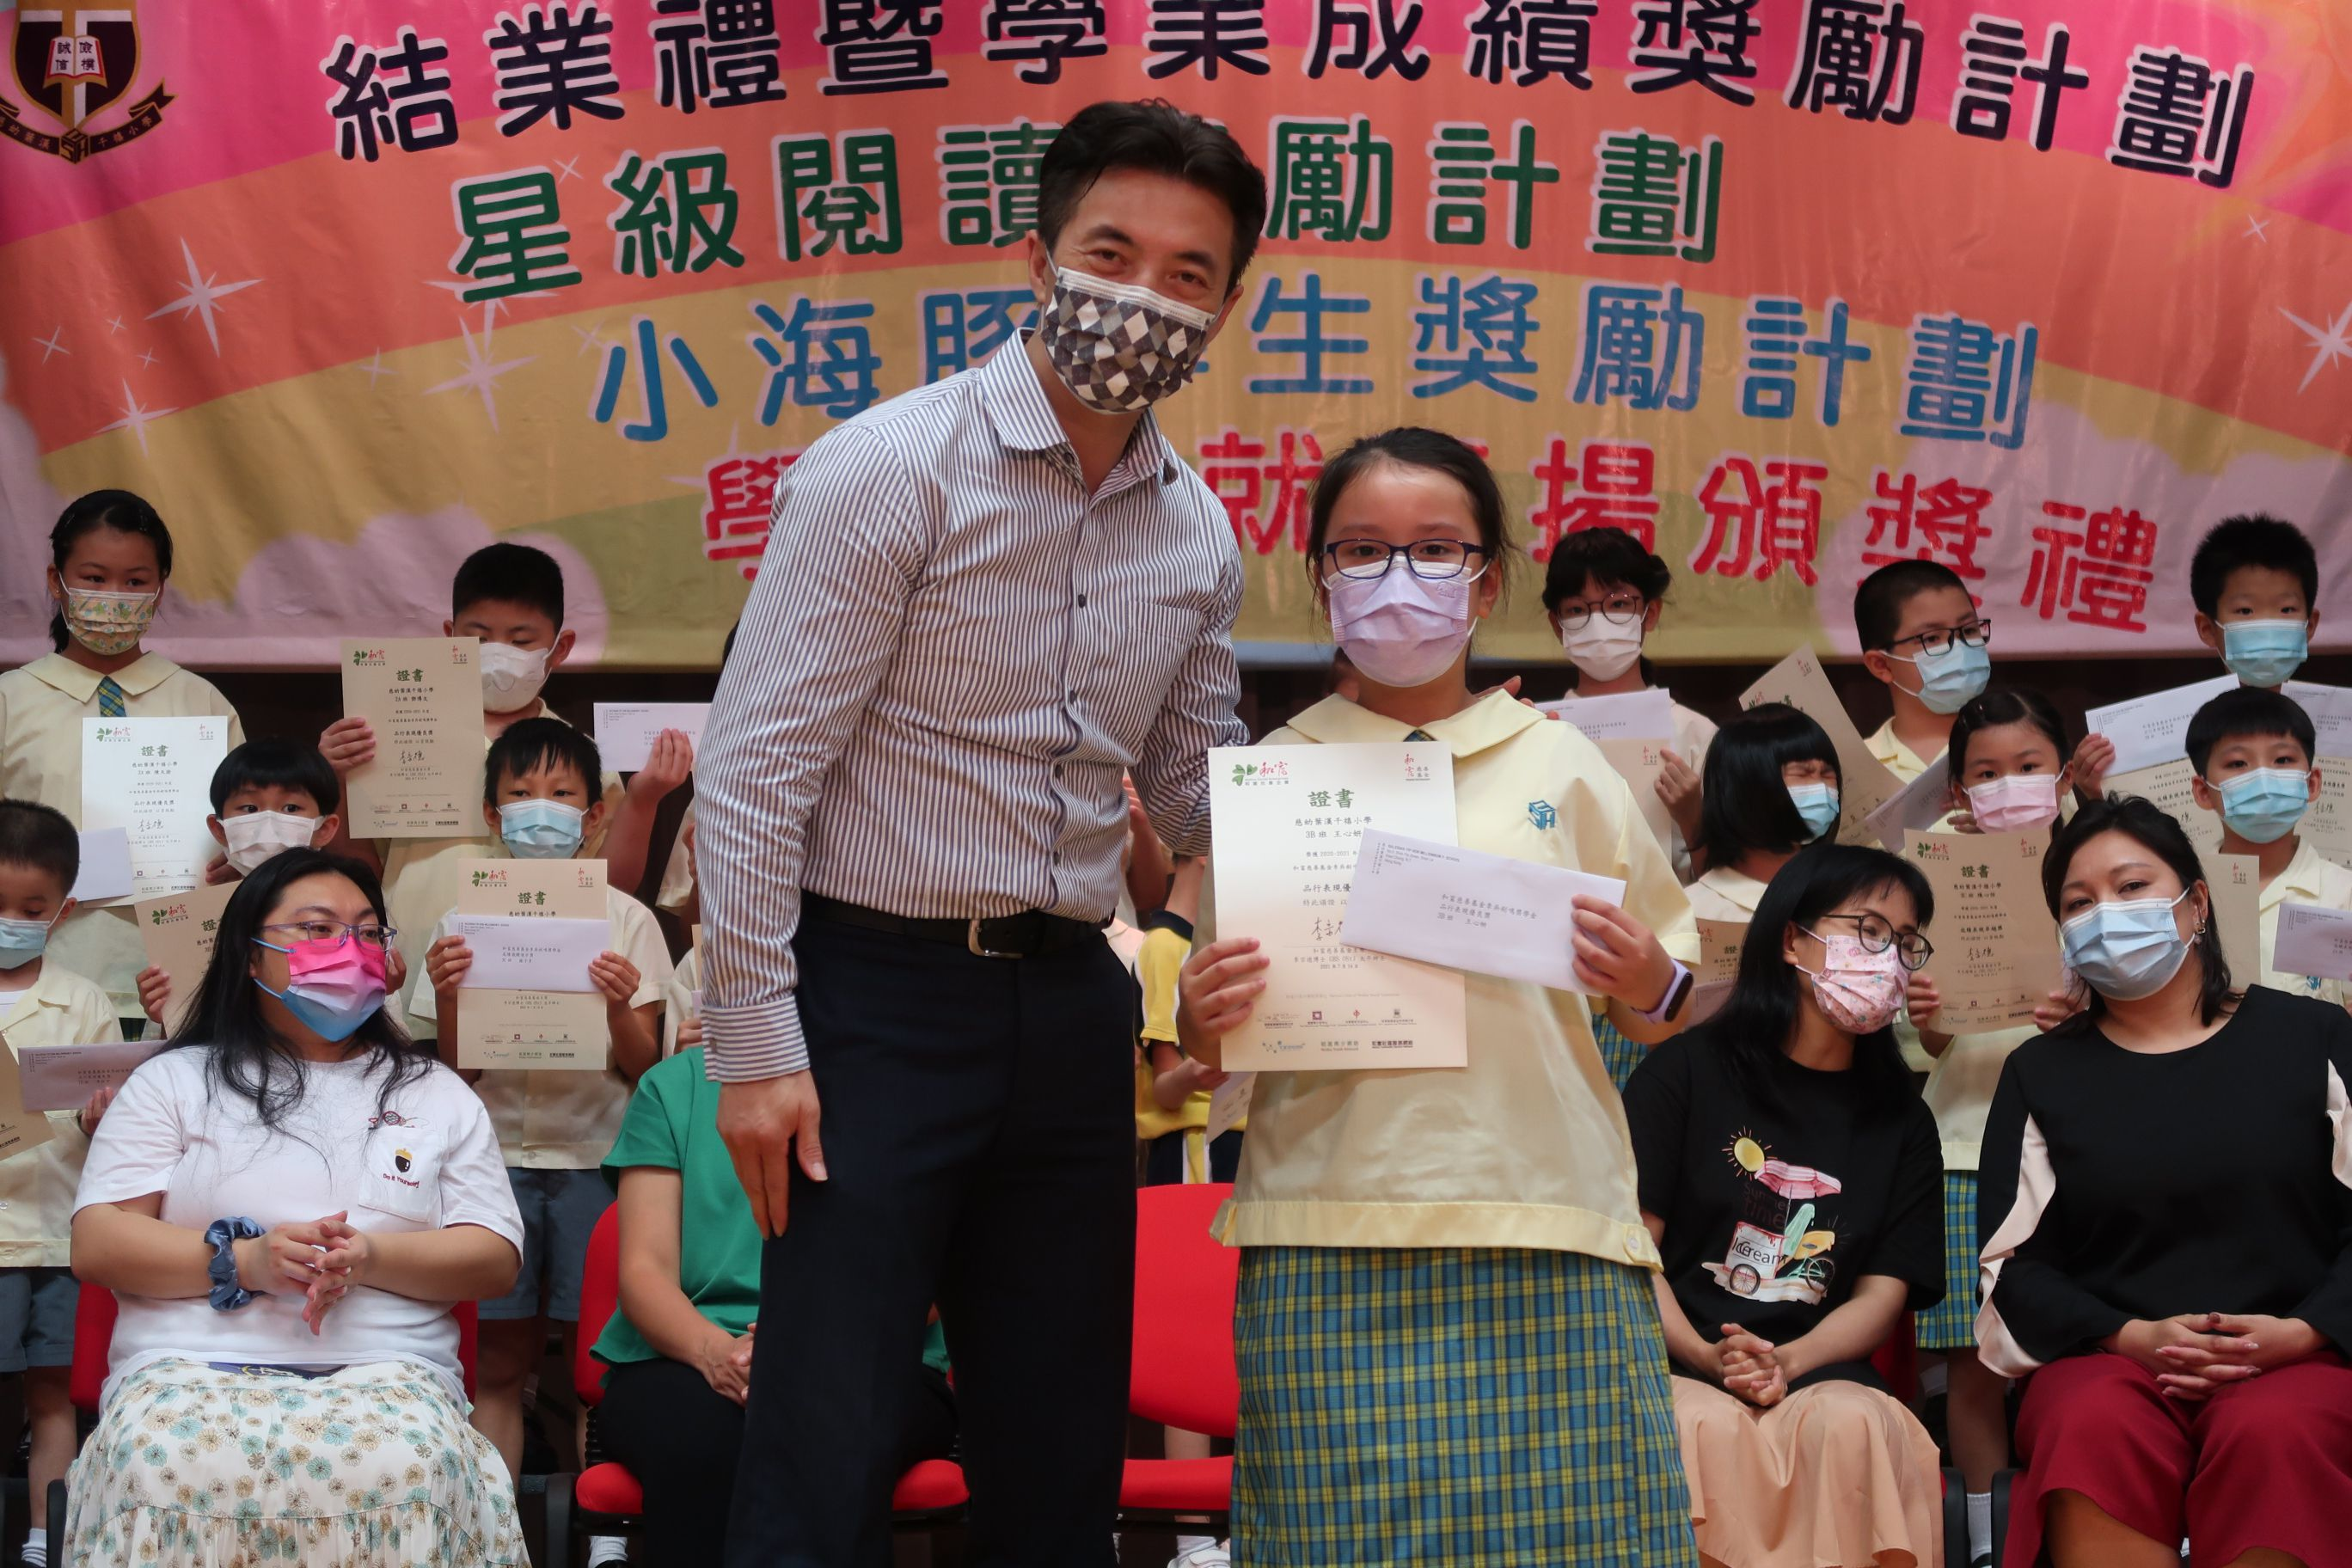 https://syh.edu.hk/sites/default/files/img_5961_1.jpg